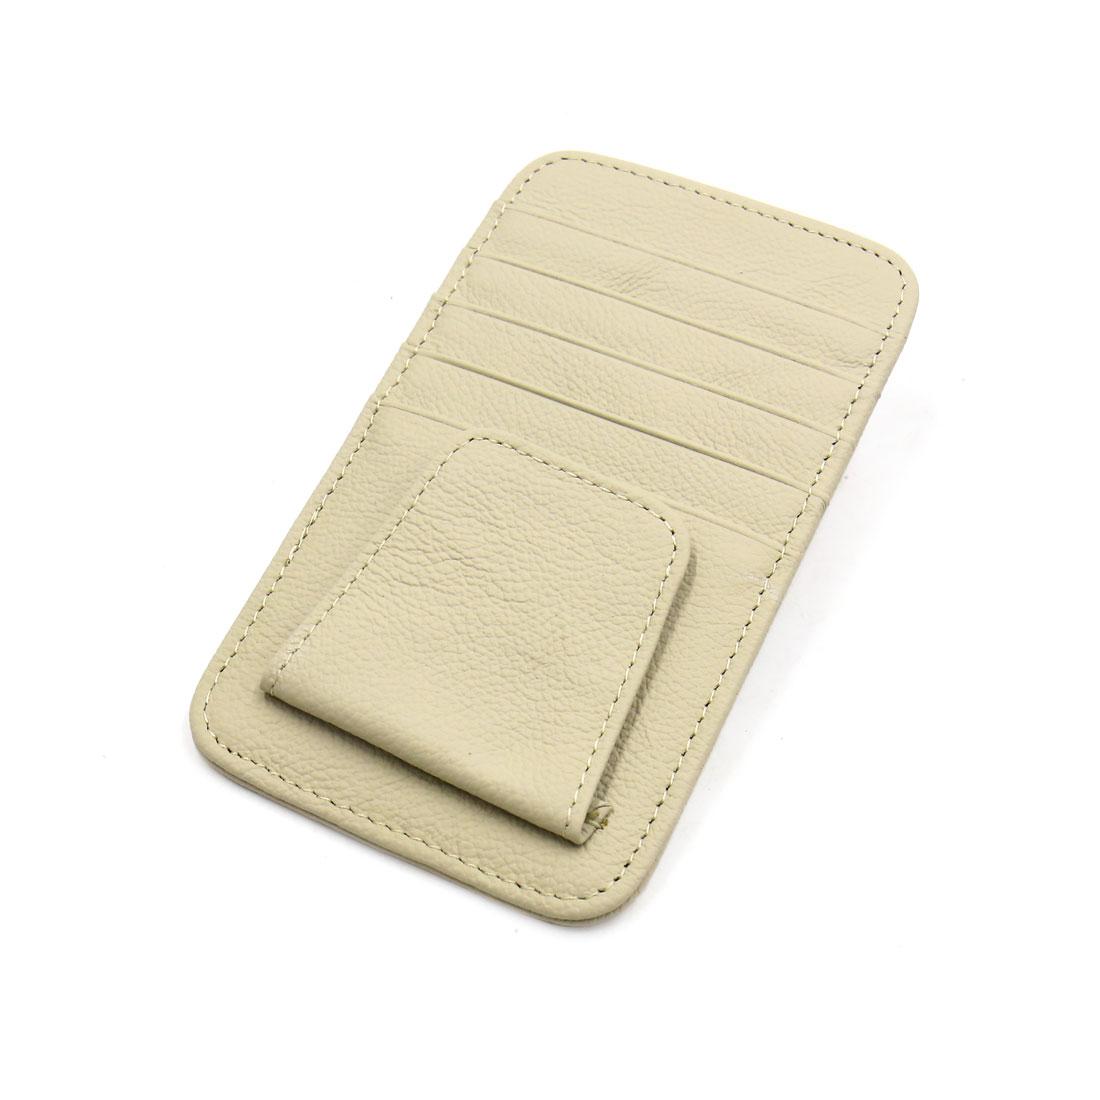 Car Sun Visor Faux Leather Credit Card Business Cards Holder Pouch Case Beige